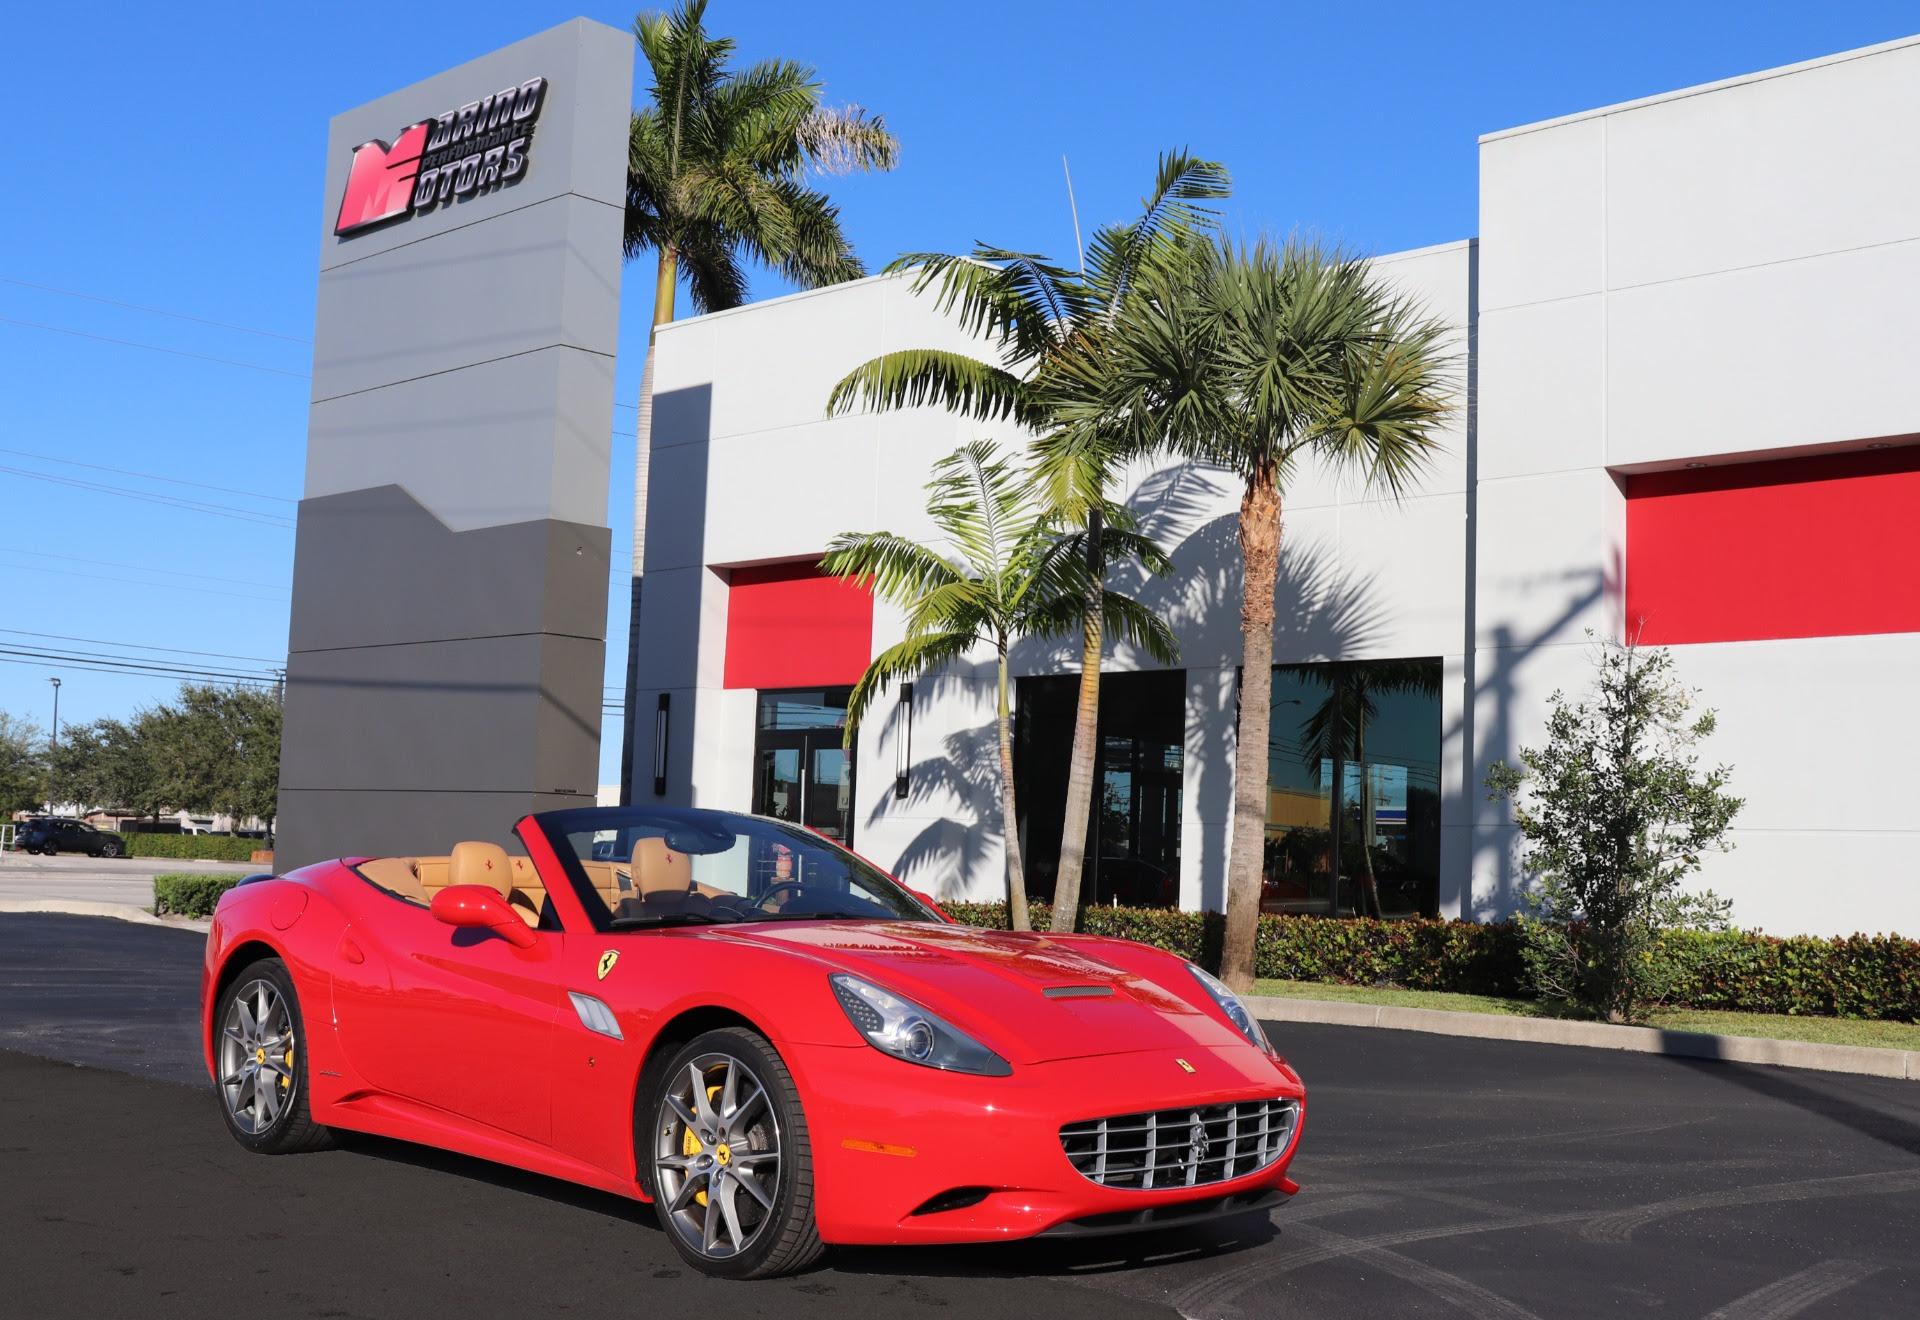 Used 2013 Ferrari California For Sale ($119,000) | Marino ...